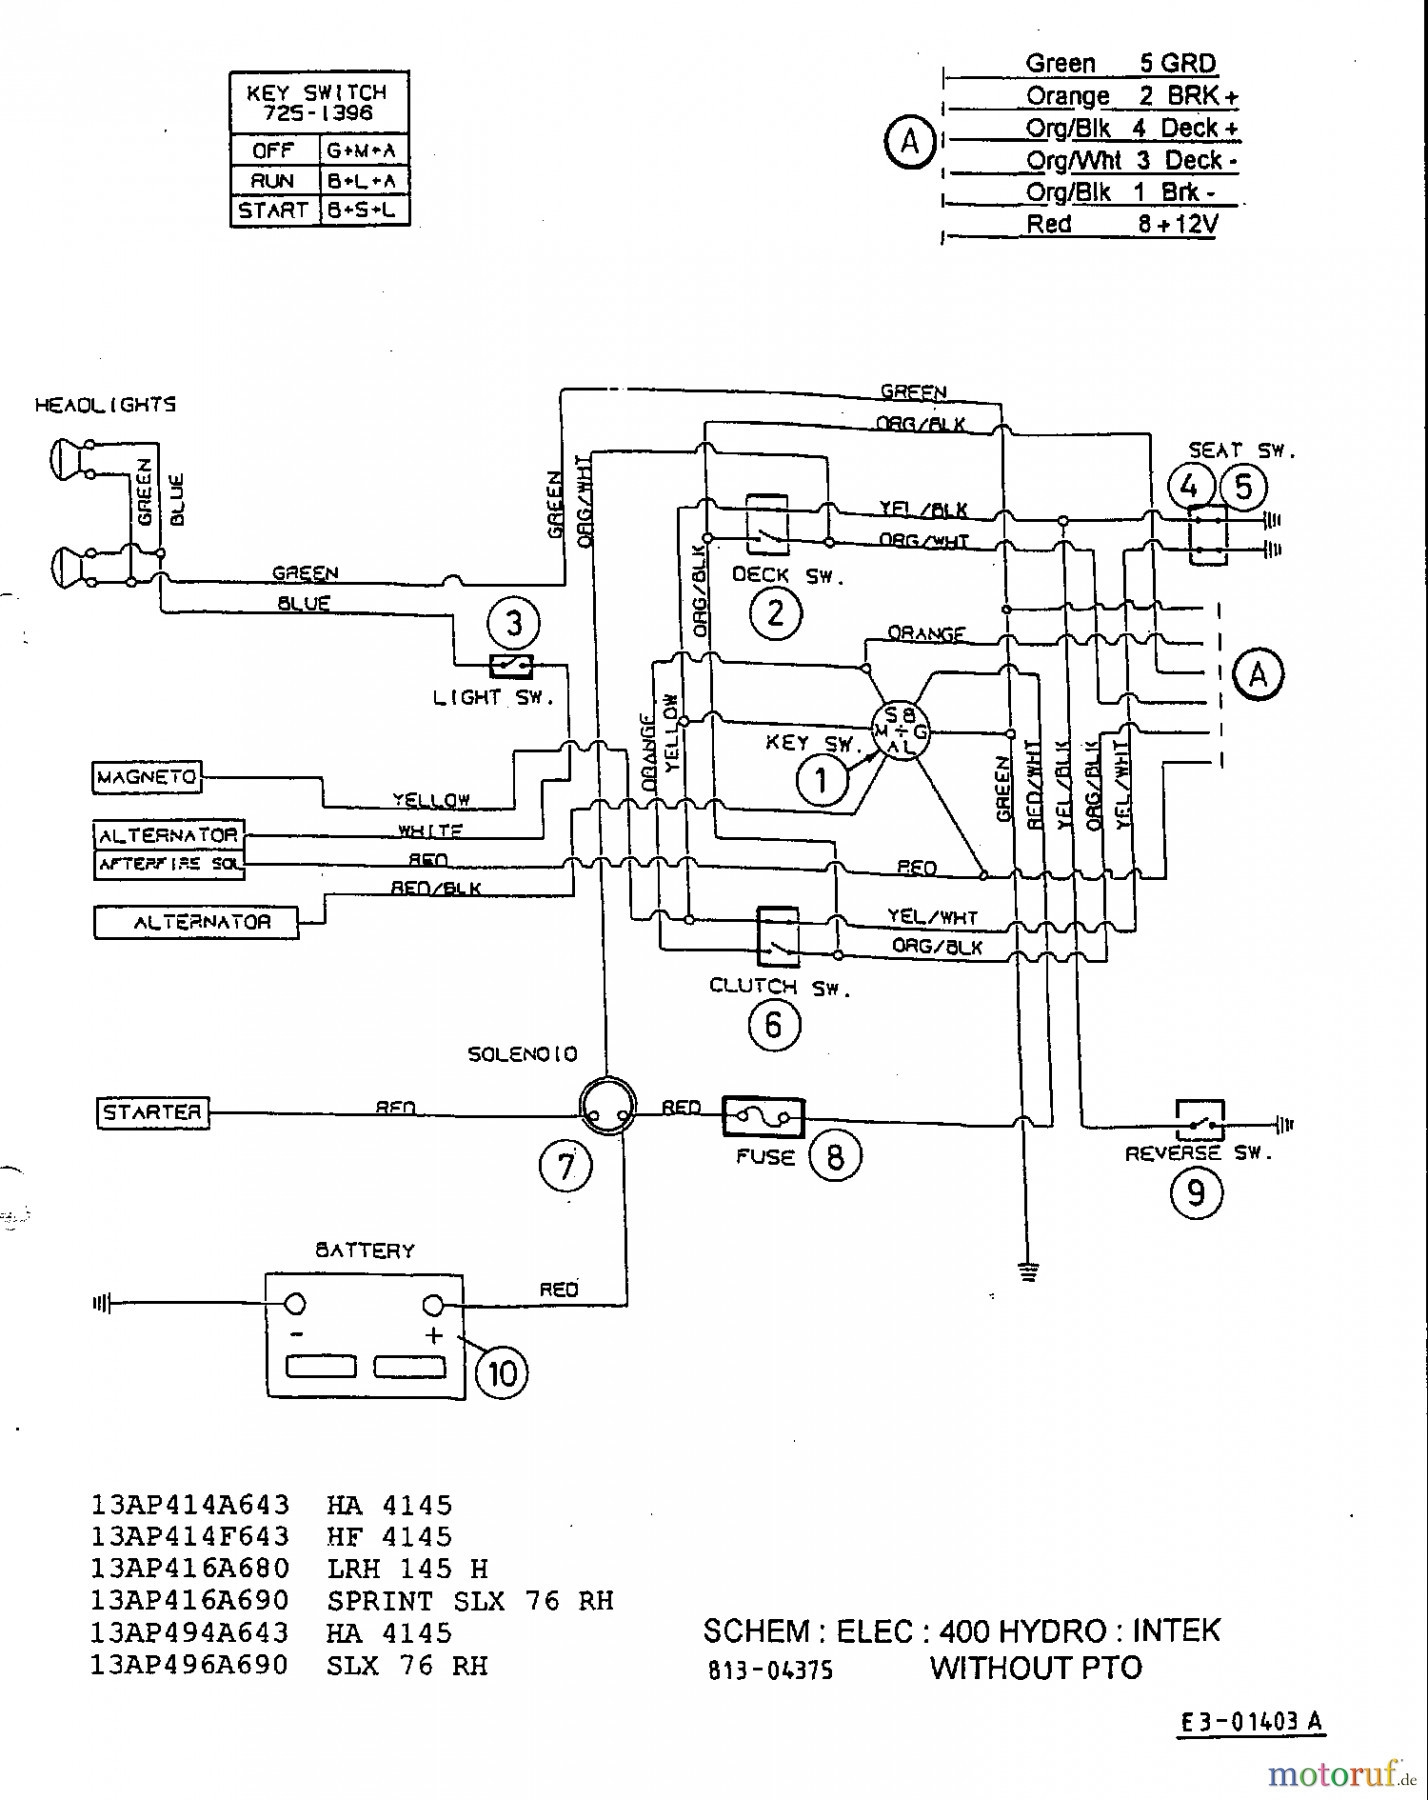 hight resolution of mtd engine diagram wiring diagram load mtd engine diagram